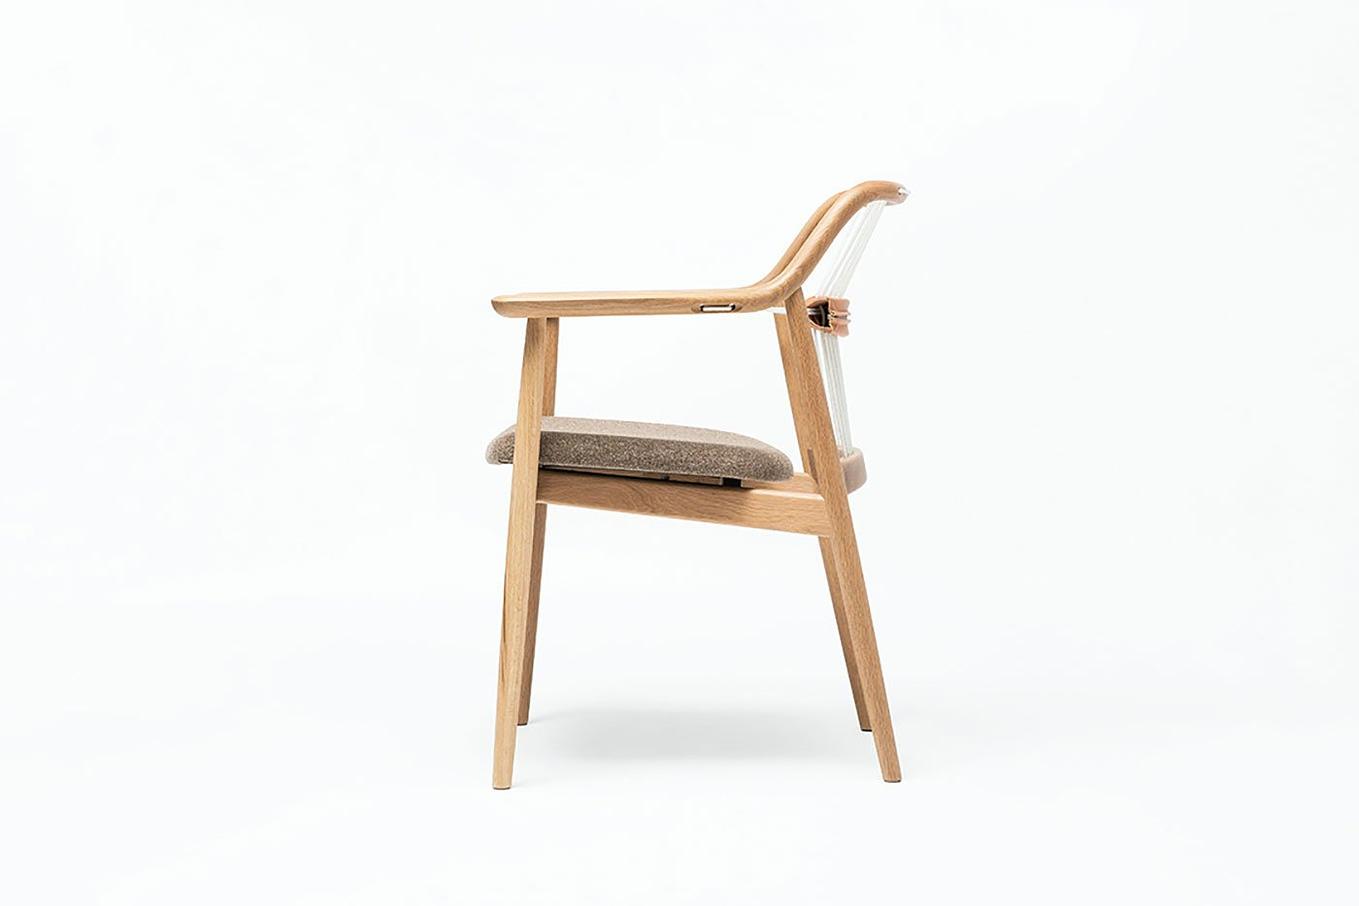 yc1-chair-by-mikiya-kobayashi-7